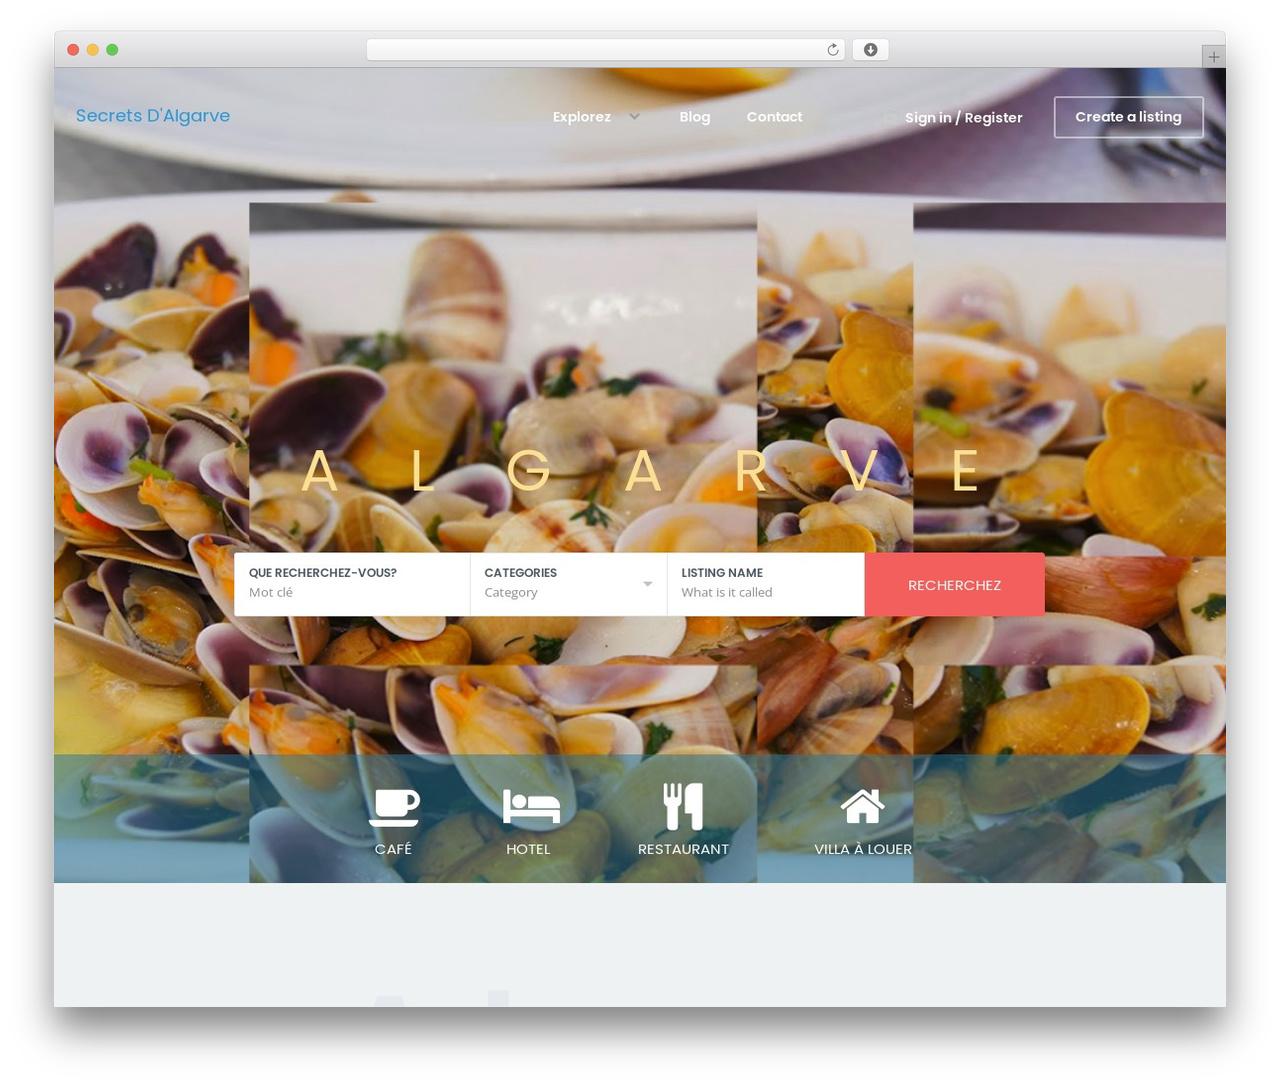 WordPress website template WhiteLab - secretsdalgarve.com